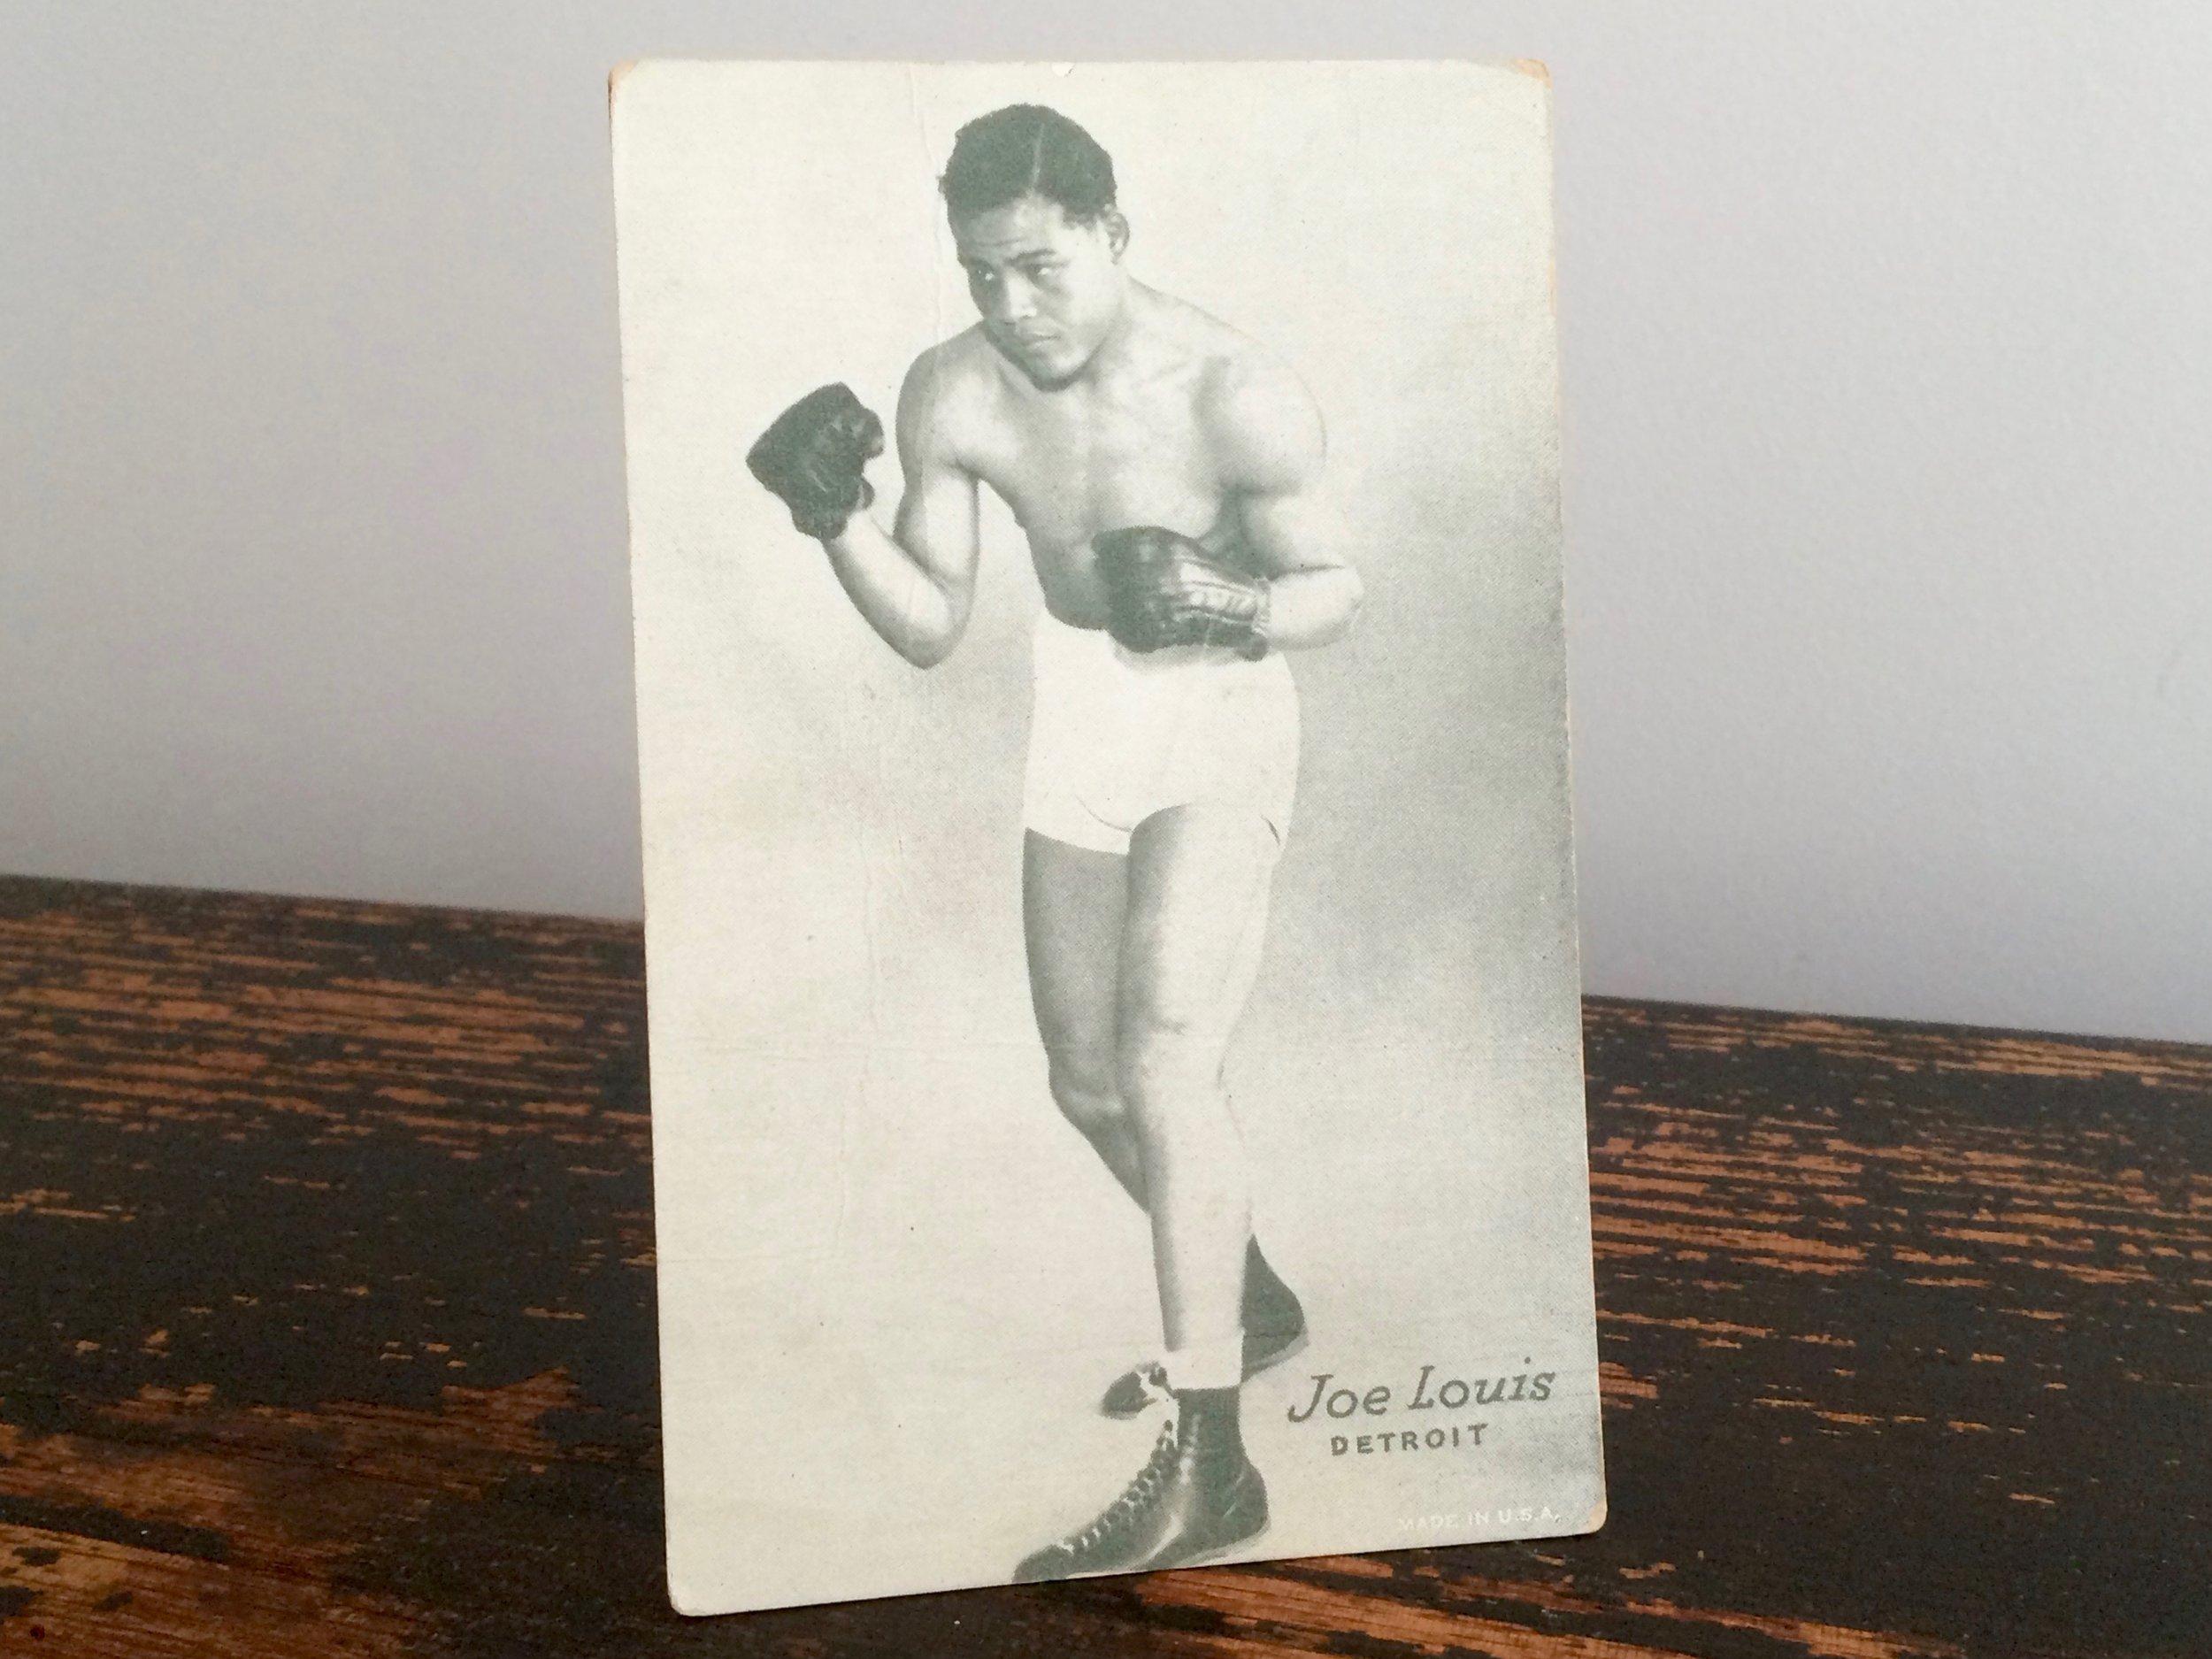 Joe Louis Exhibit Card